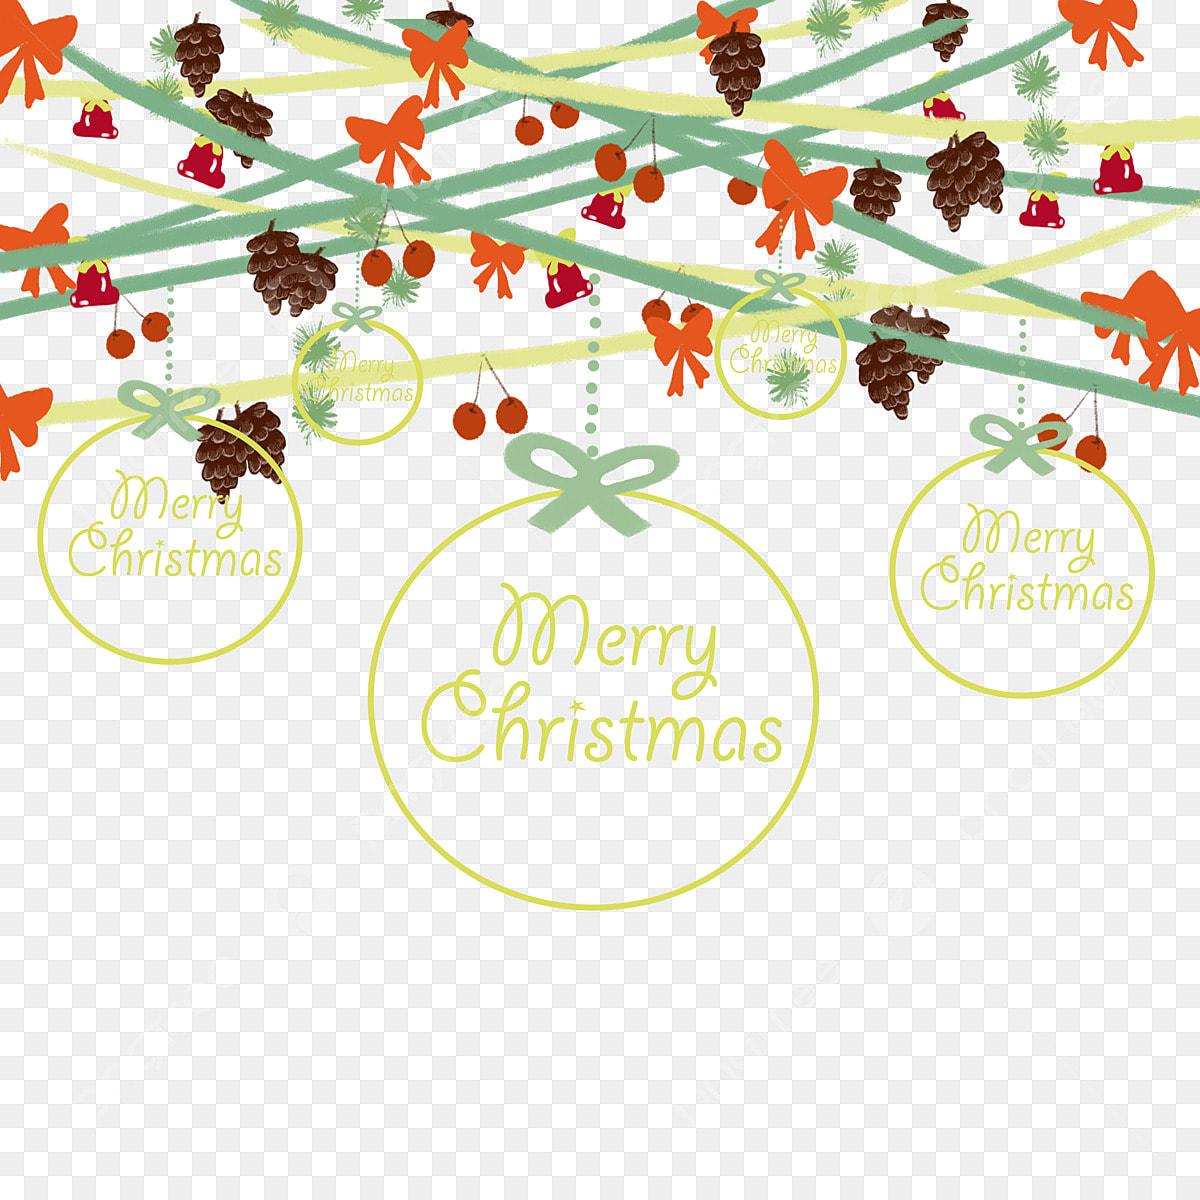 Merry Christmas Ribbon Clipart.Christmas Christmas Pine Cone Christmas Bow Merry Christmas